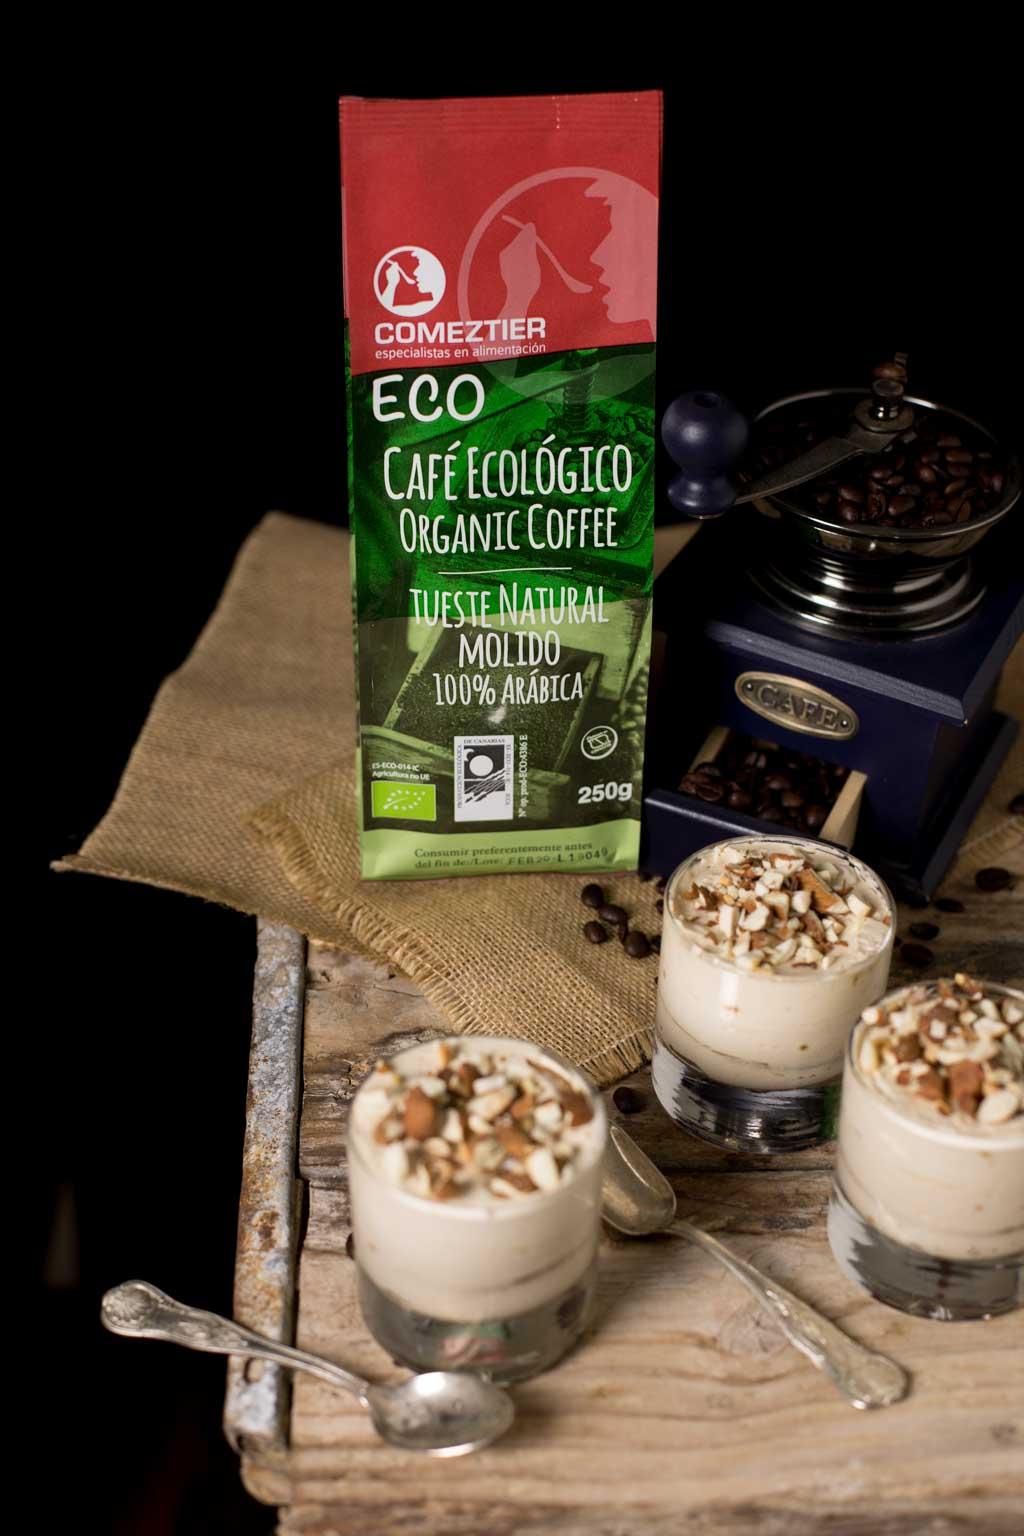 postre-de-cafe con café ECO de Comeztier